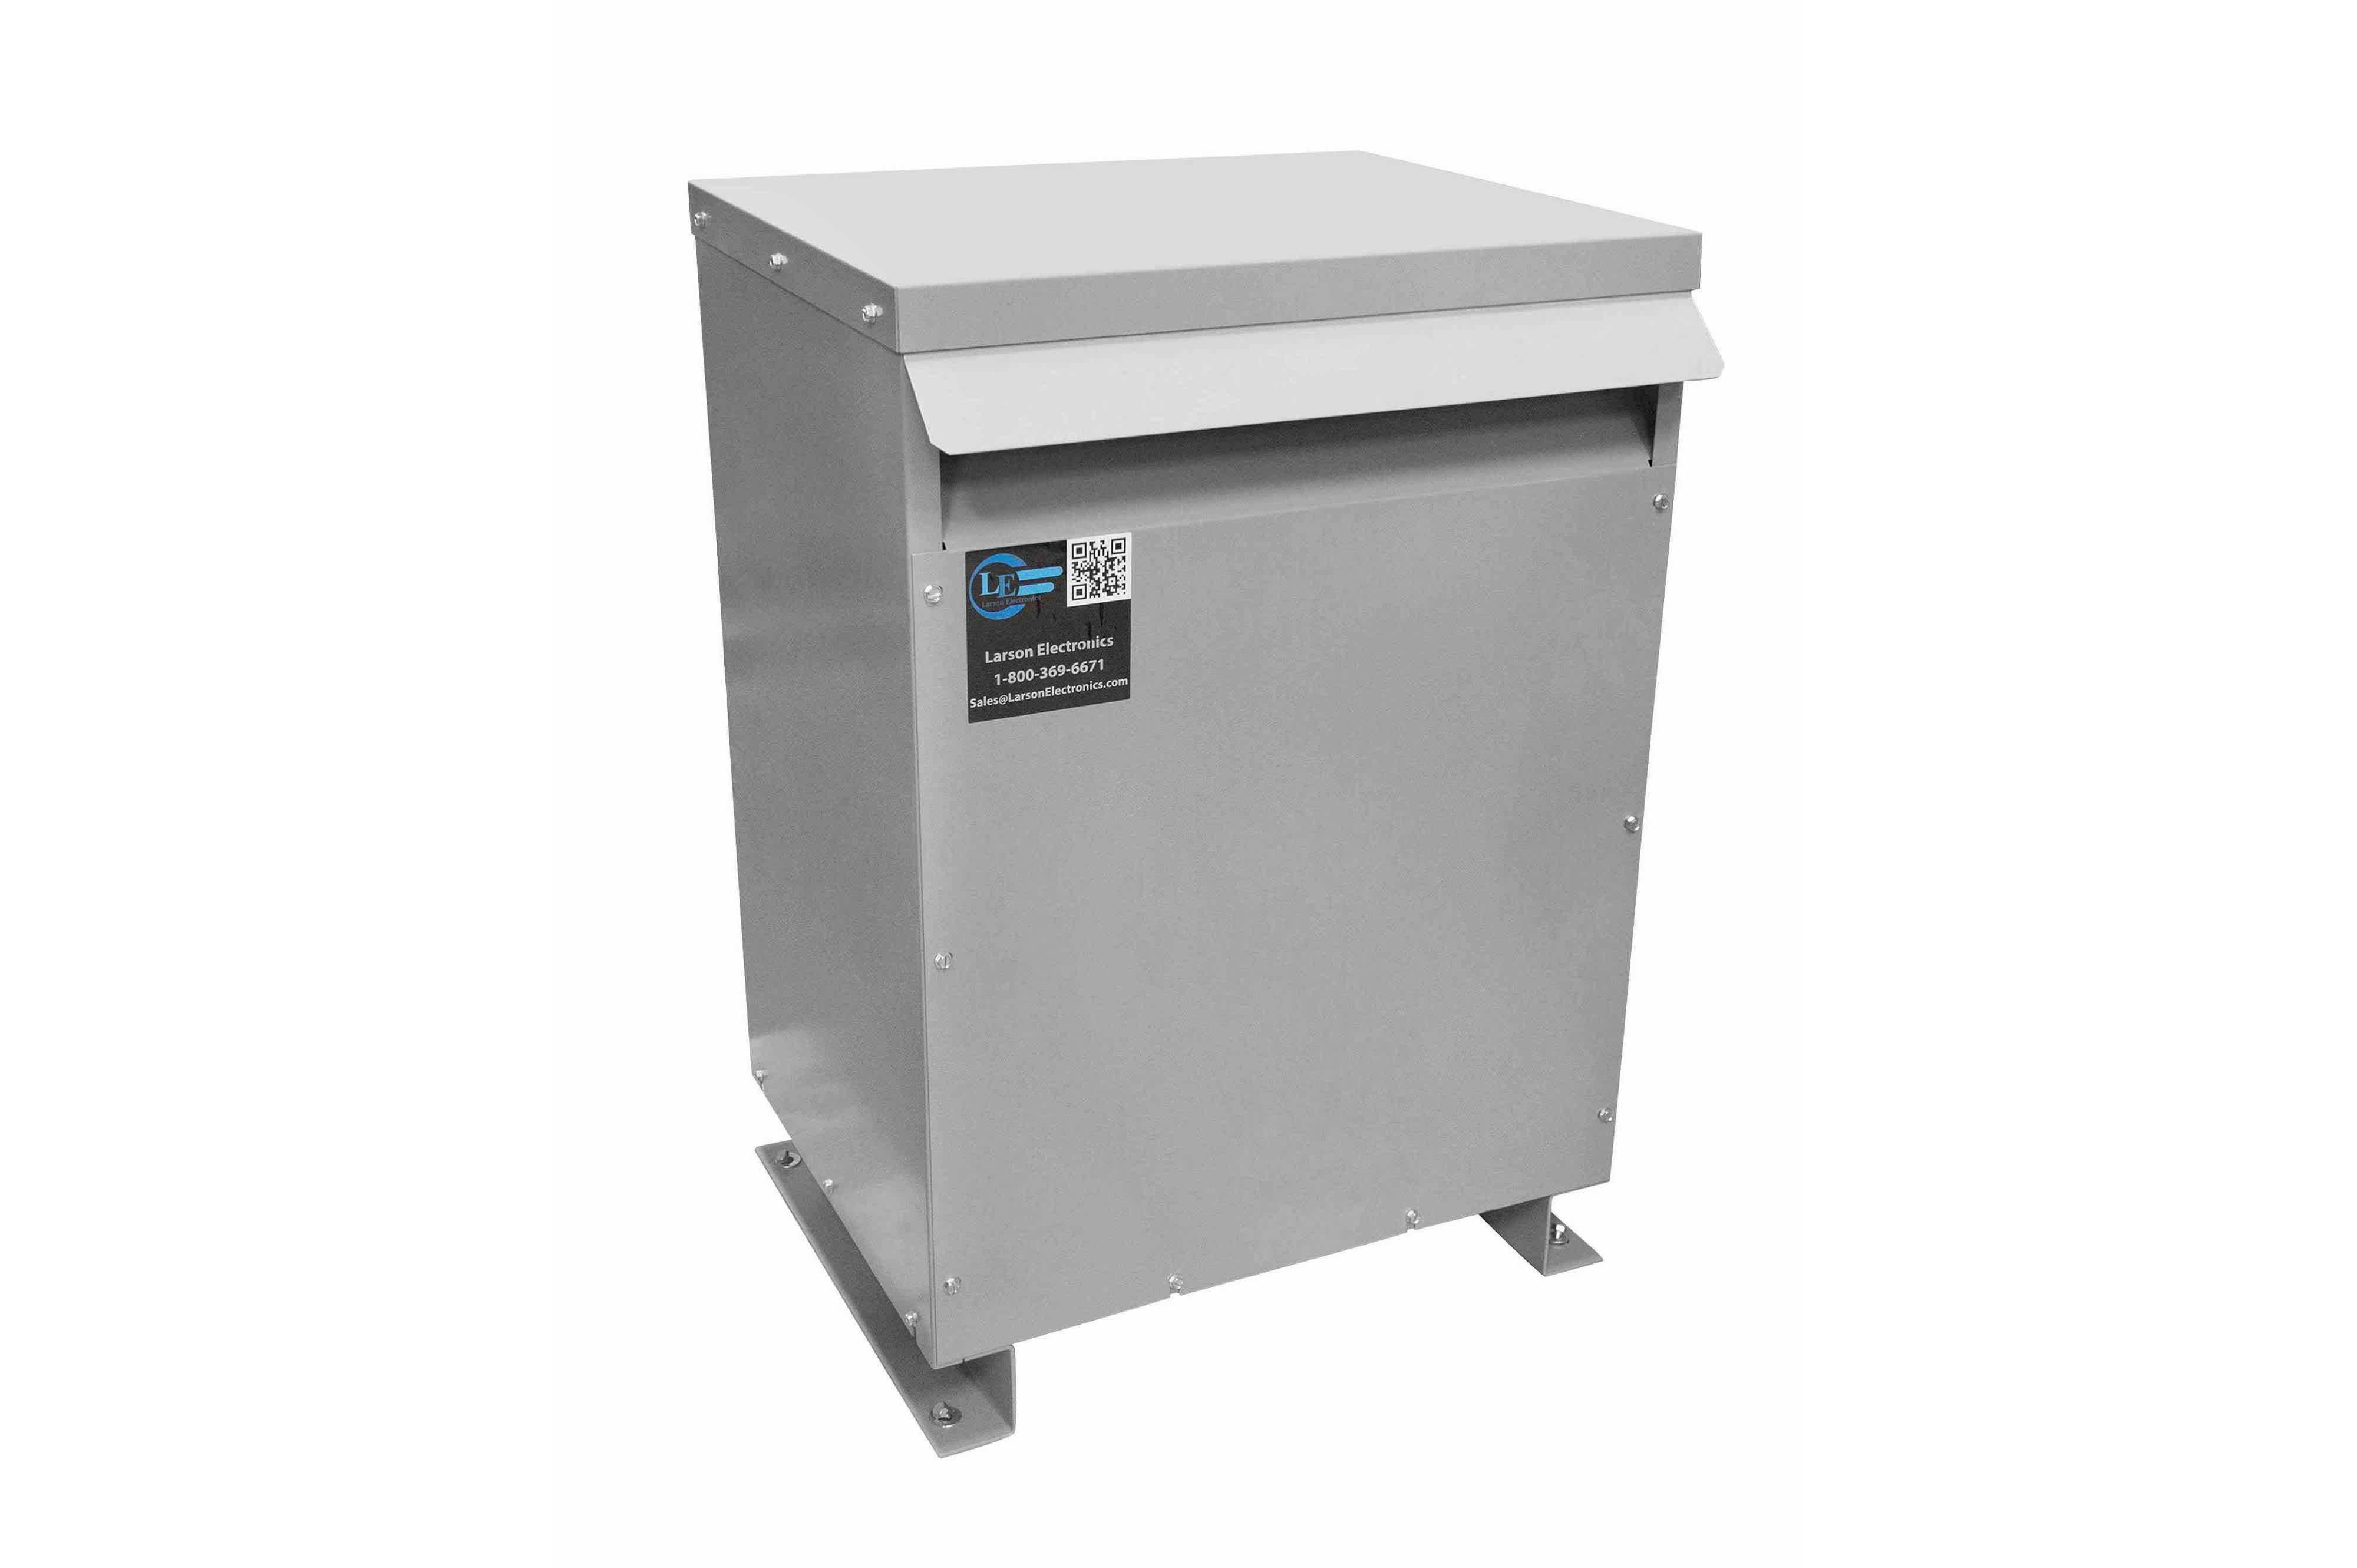 38 kVA 3PH Isolation Transformer, 208V Wye Primary, 240V Delta Secondary, N3R, Ventilated, 60 Hz